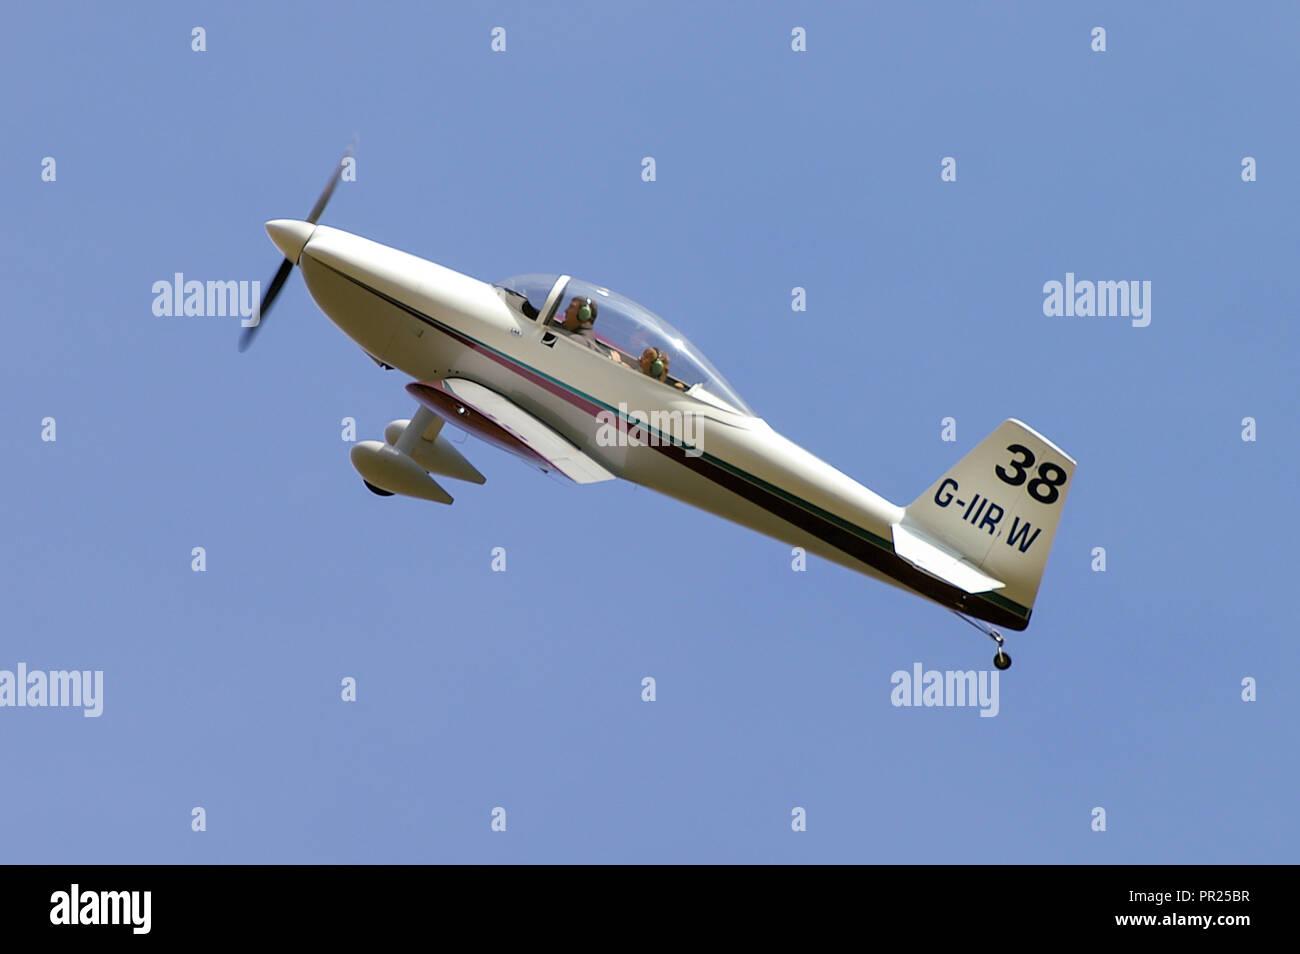 Sturgis Vans RV-8 G-IIRW 'Race 38' turning a corner at an air race at Sywell Aerodrome. Royal Aero Club RAeC Air Race. Cornering. Racing. Blue sky - Stock Image